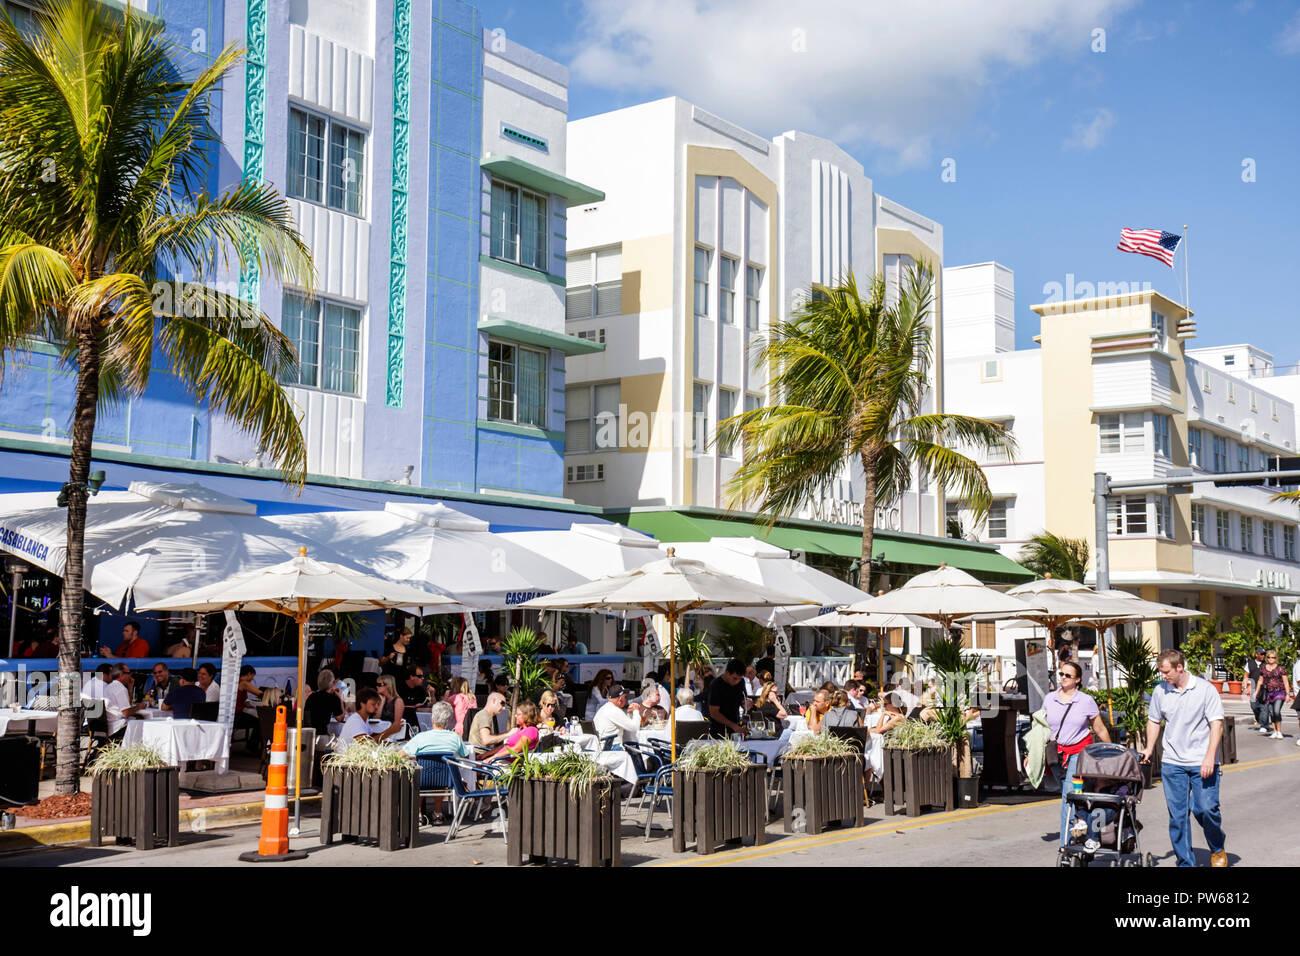 "Florida, FL, South, Miami Beach, SoBe, Art Deco District, ""Ocean Drive"", New Year's Day, Casablanca, hotel hotels lodging inn motel motels, street, si Stock Photo"